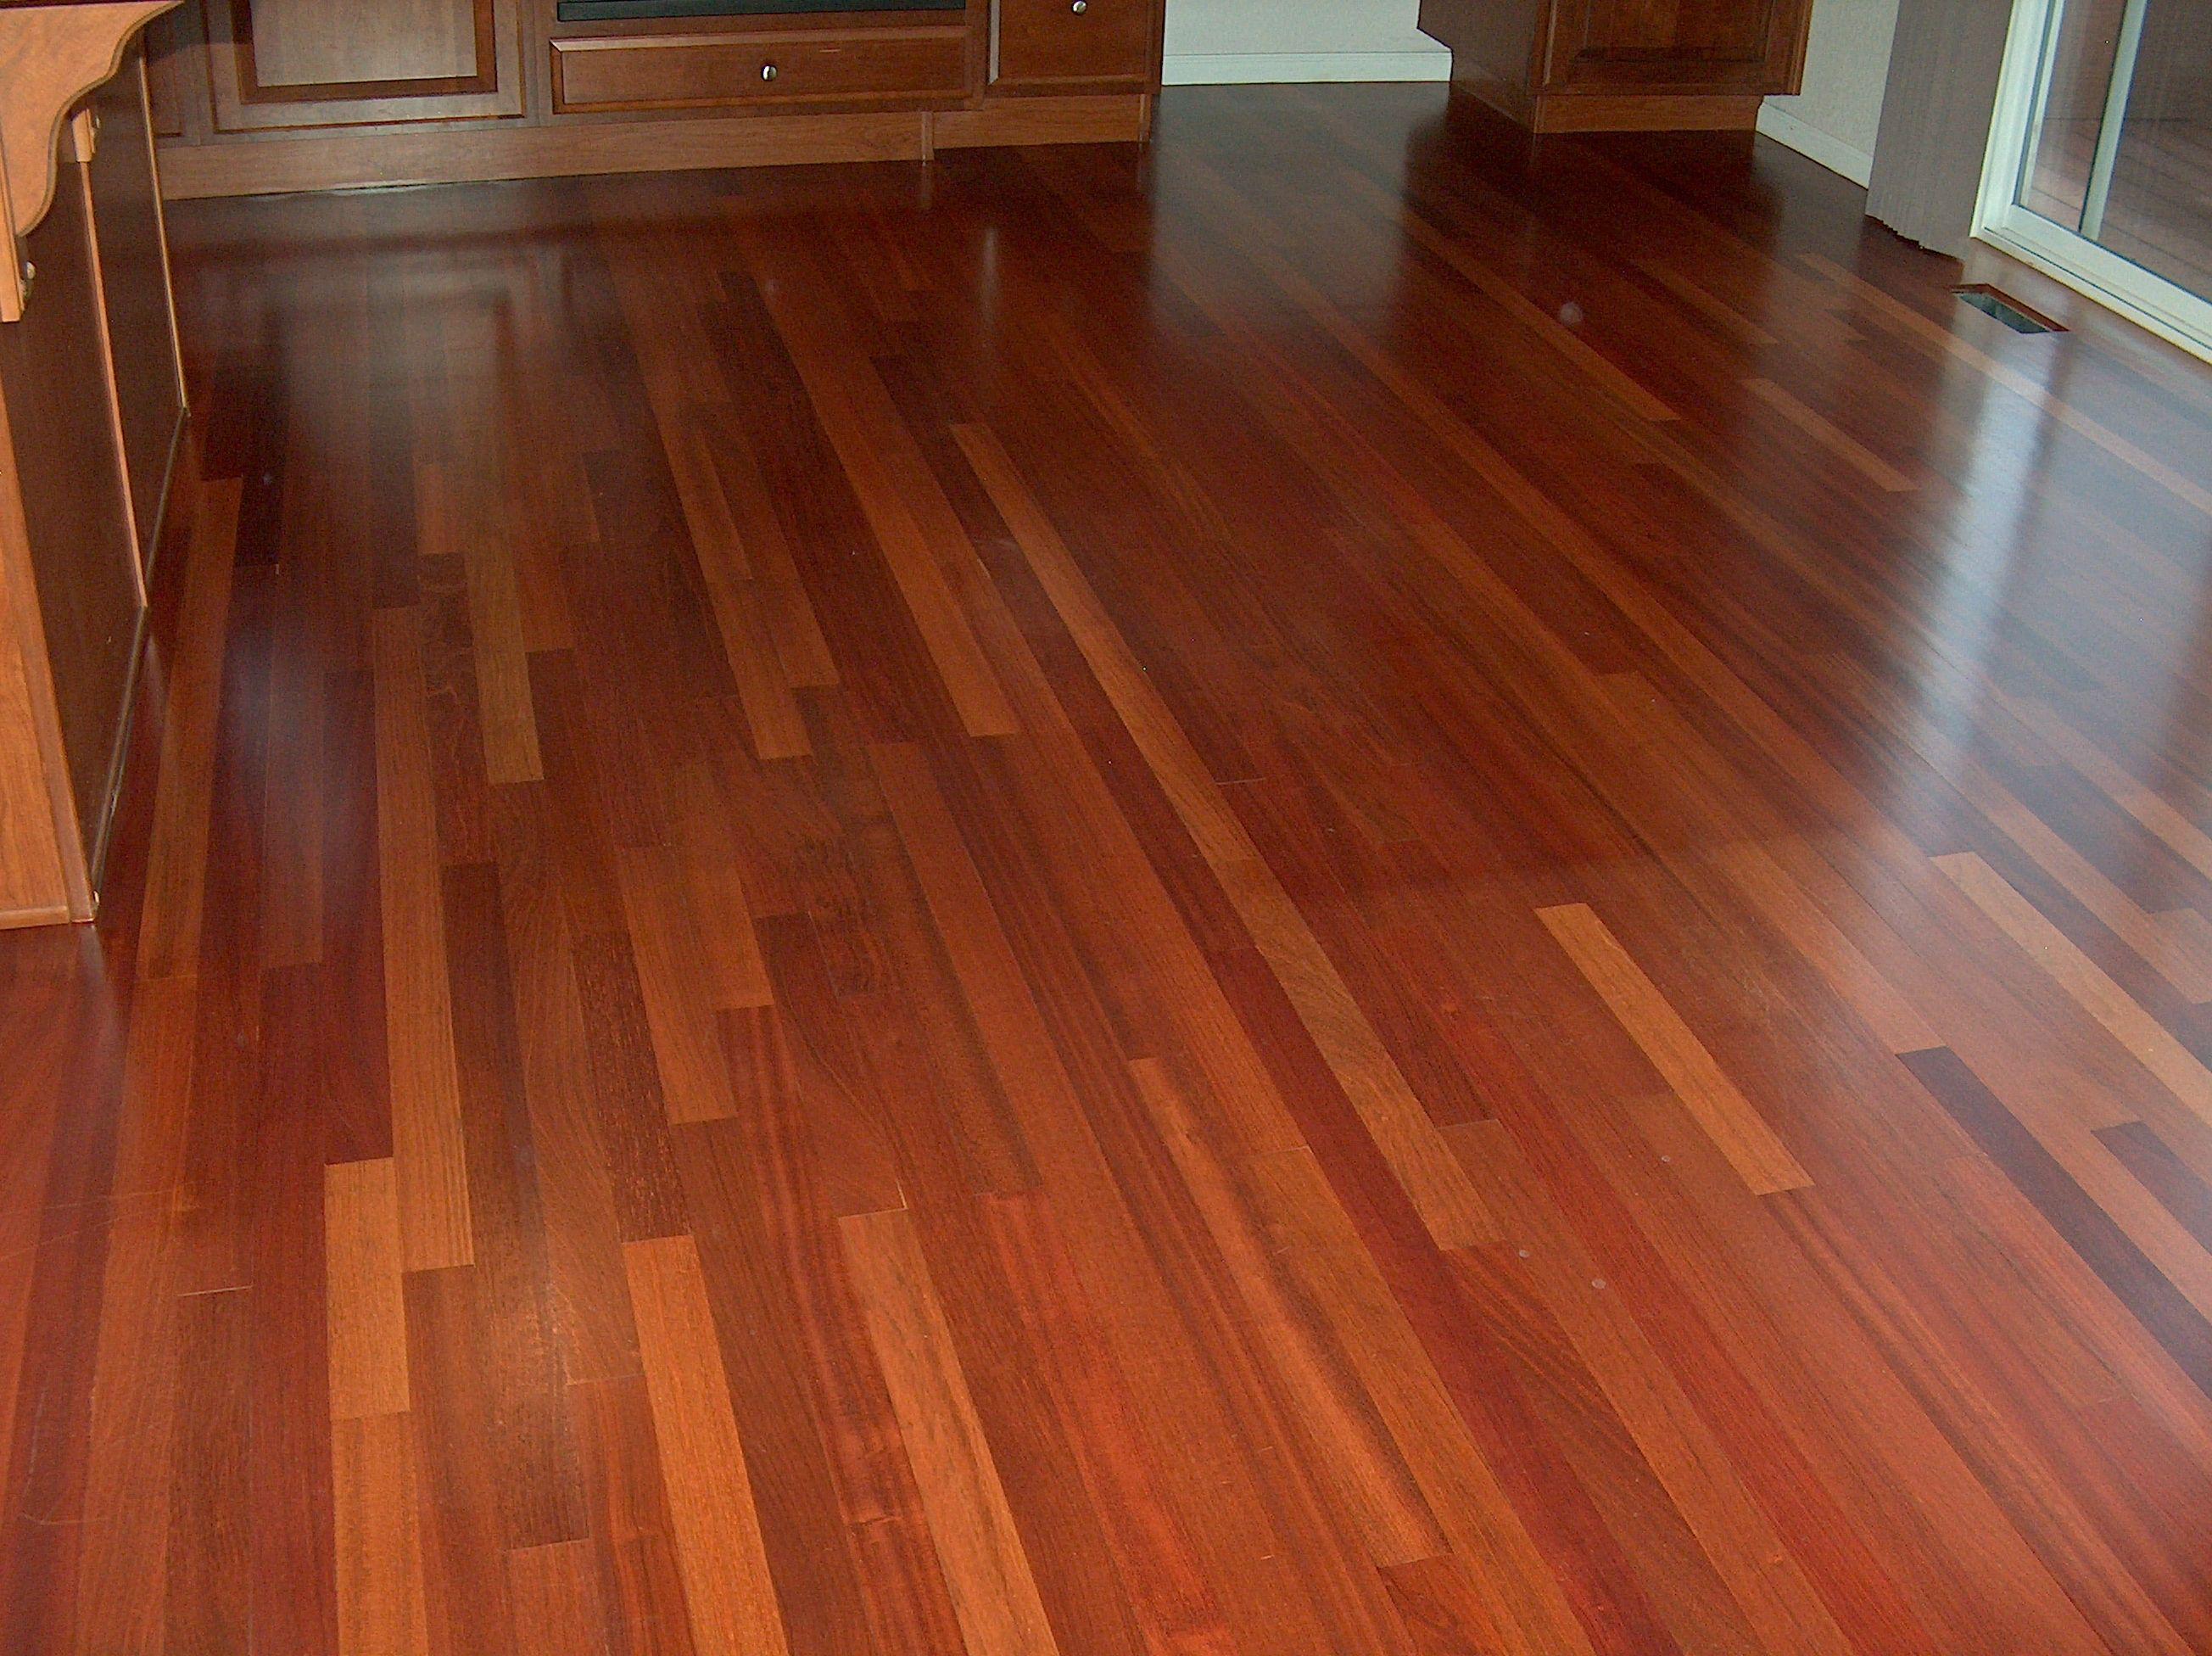 Ordinary Cherry Engineered Hardwood Flooring Part - 2: Cherry Engineered Wood Flooring   Brazilian Cherry Flooring